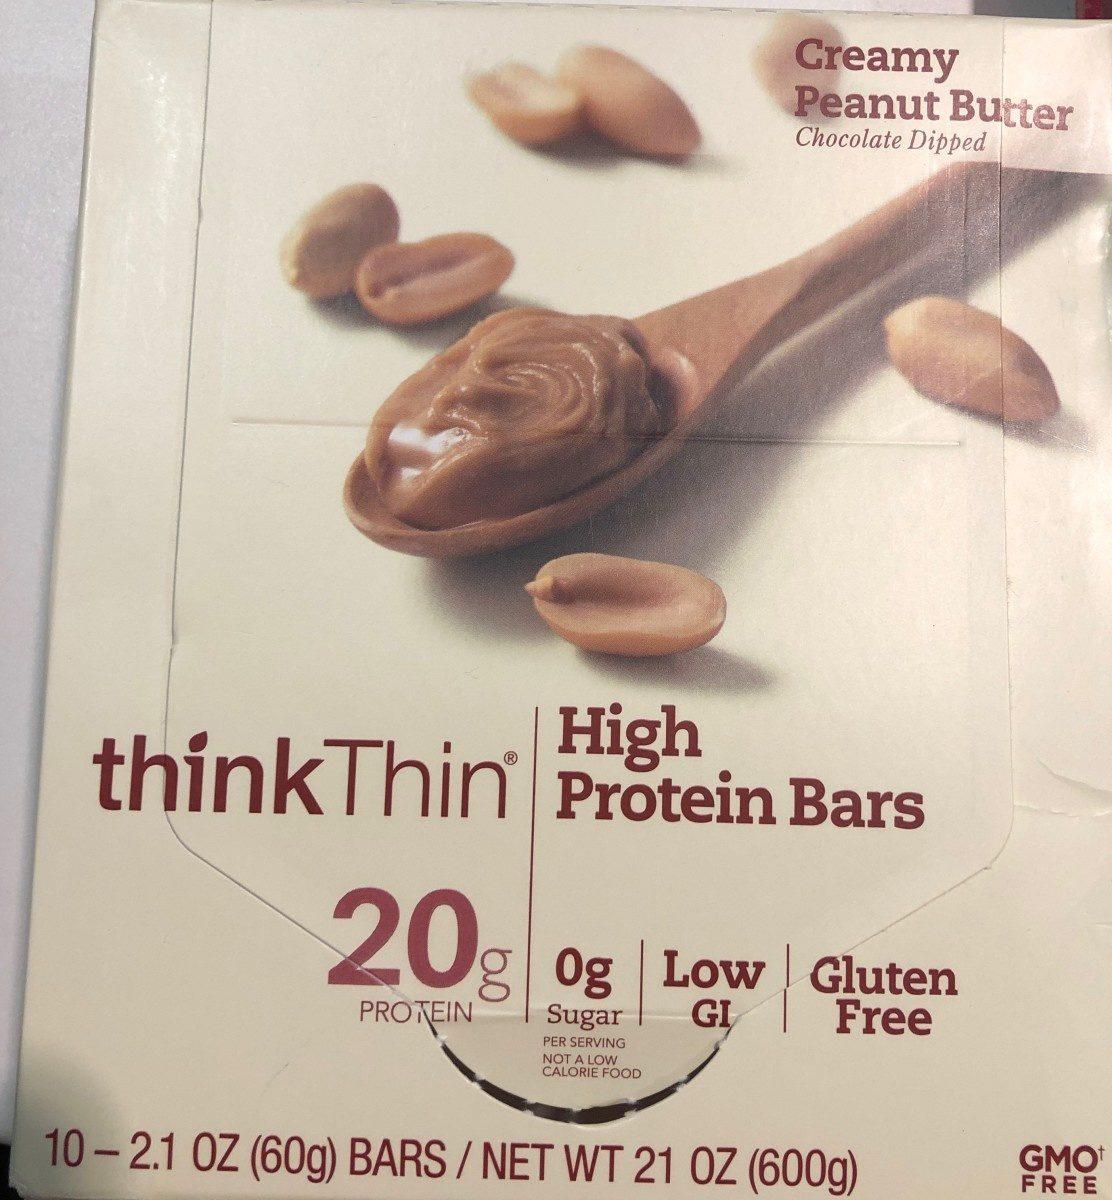 Creamy peanut butter chocolate dipped high protein bars, creamy peanut butter - Product - en